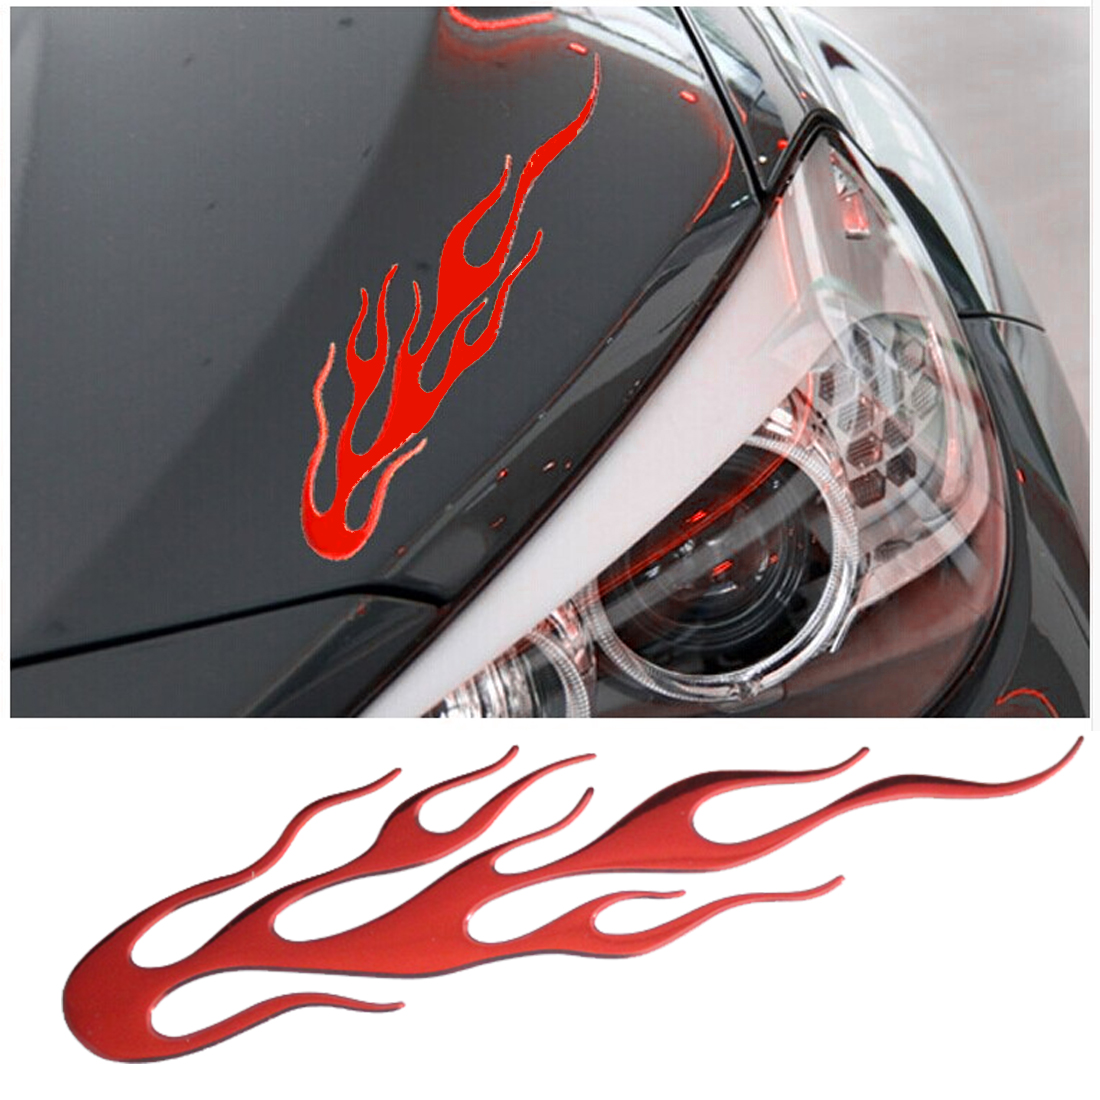 Dewtreetali Hot Sale  3D Flame Car Styling Emblem Badge Sticker PVC Car Sticker For Rearview Mirror